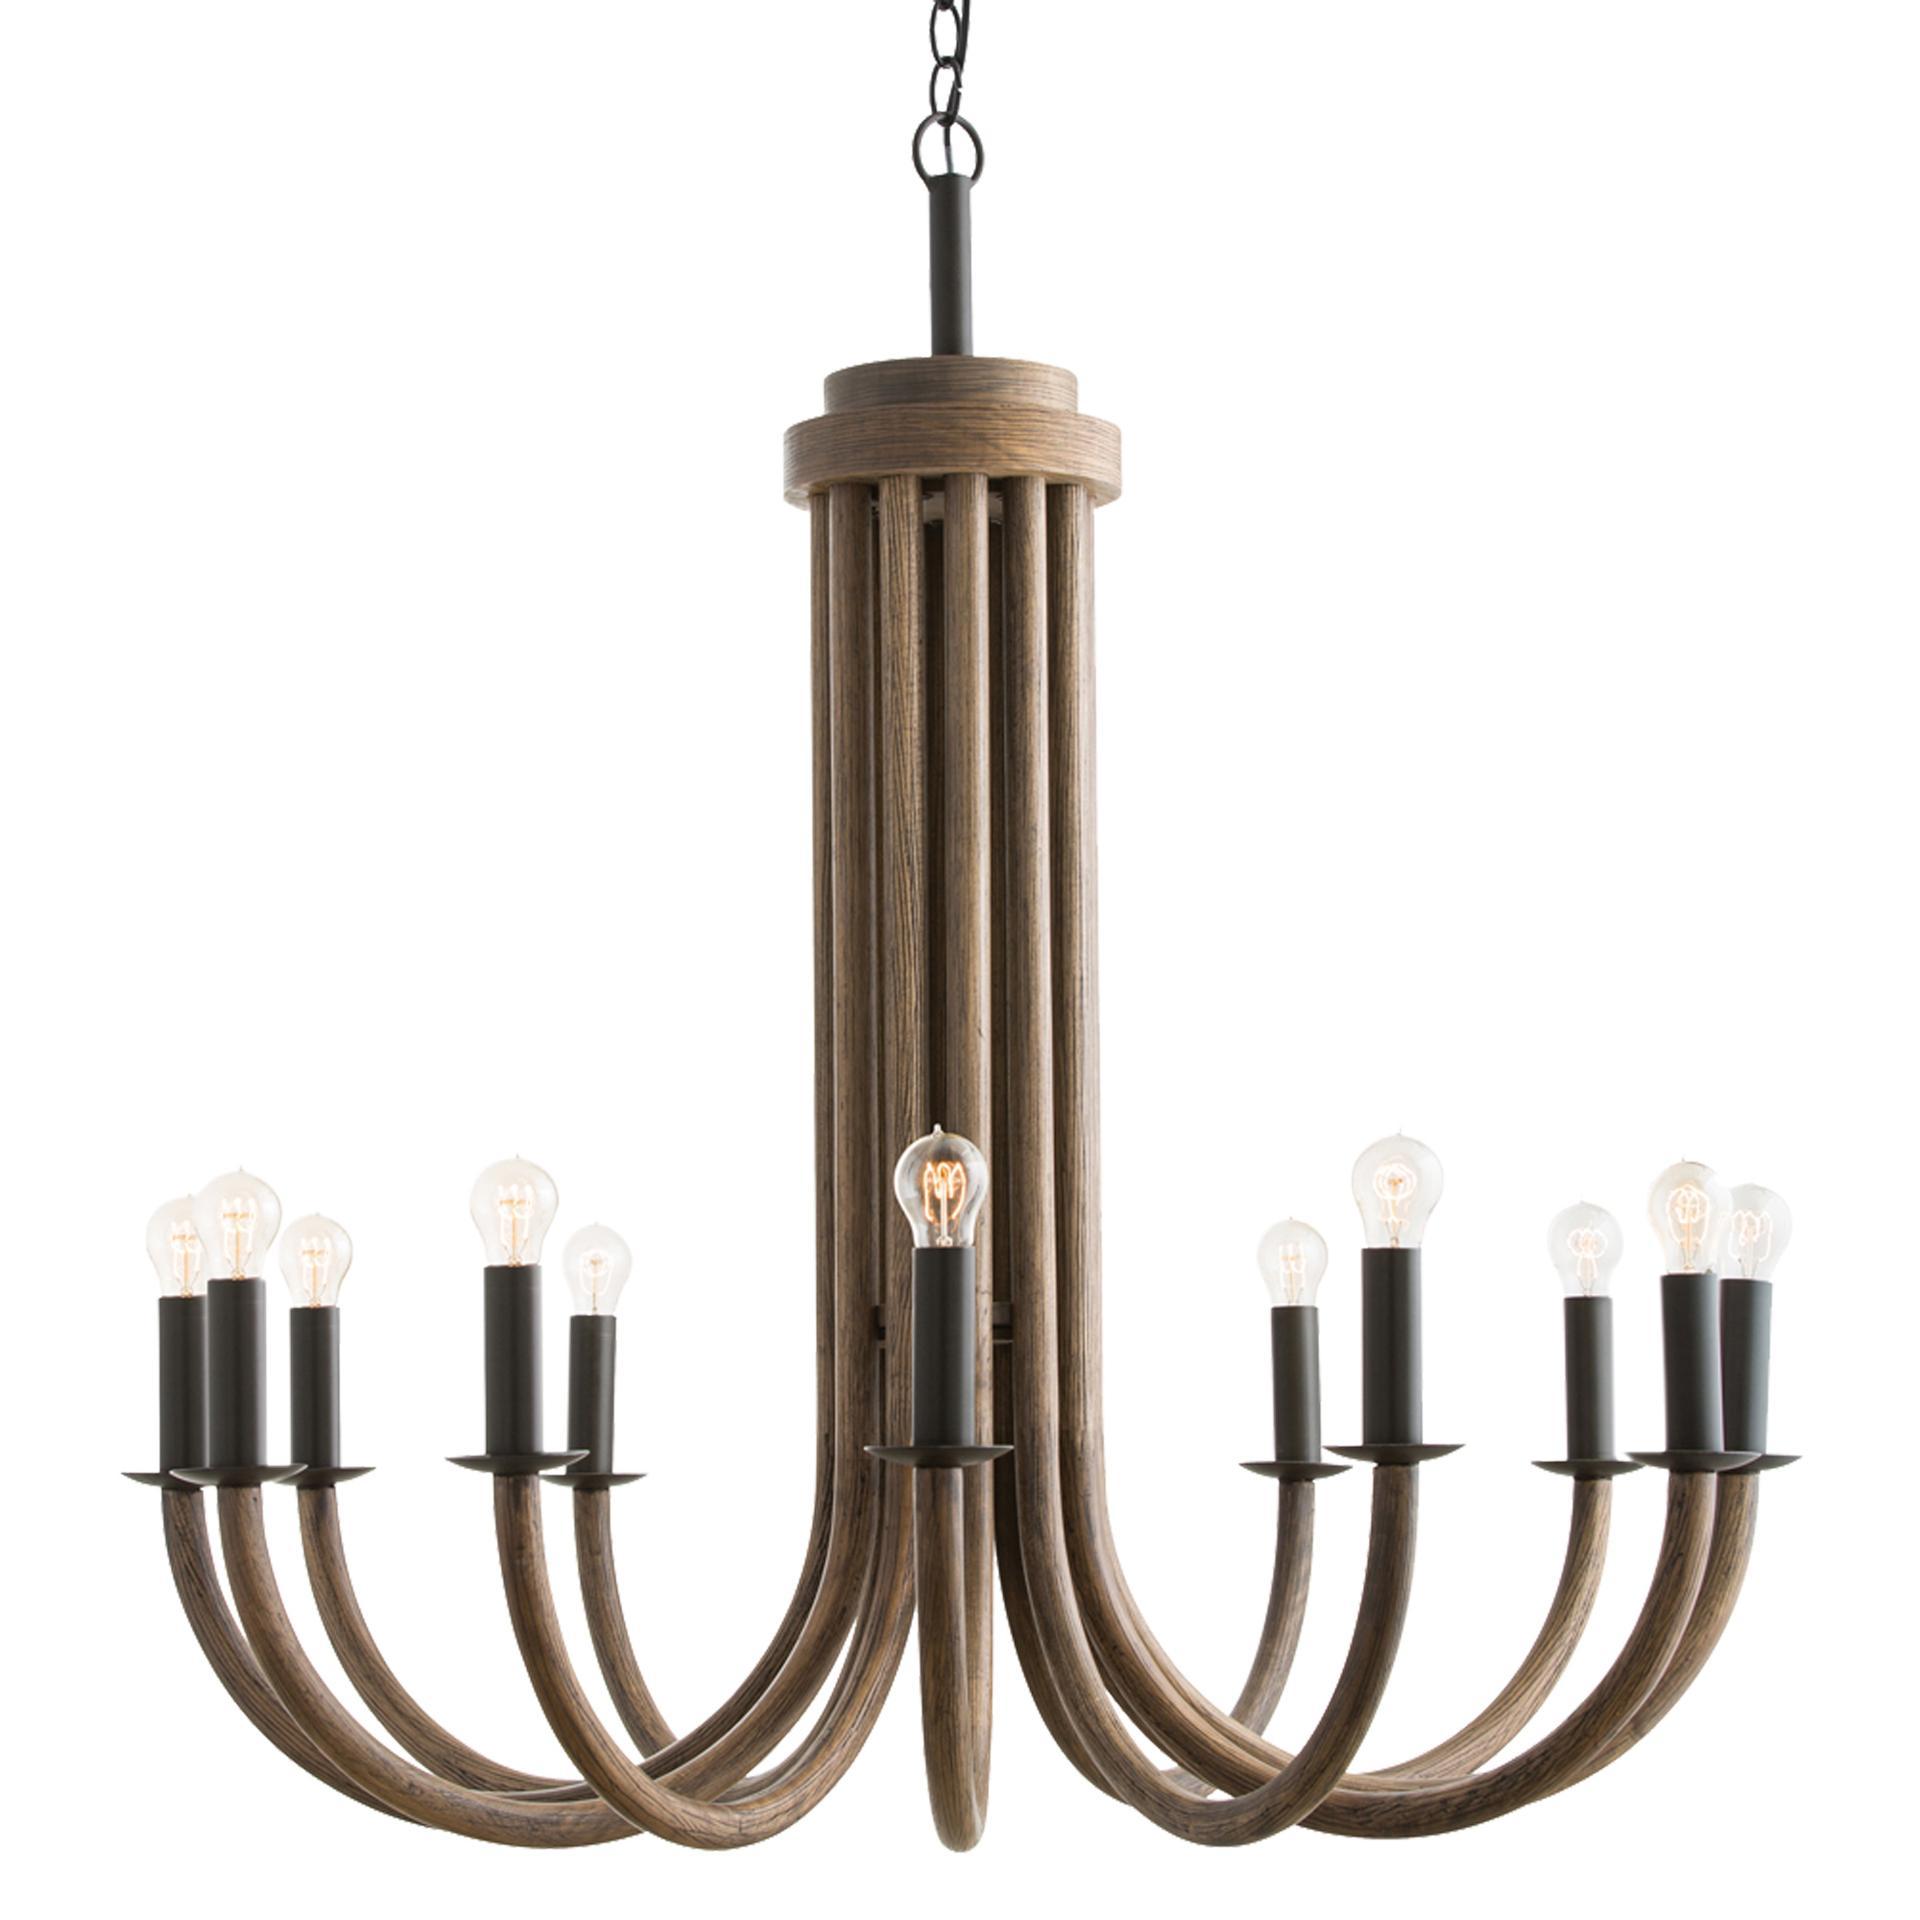 Rustic outdoor chandelier decor ideasdecor ideas for Rustic outdoor chandelier